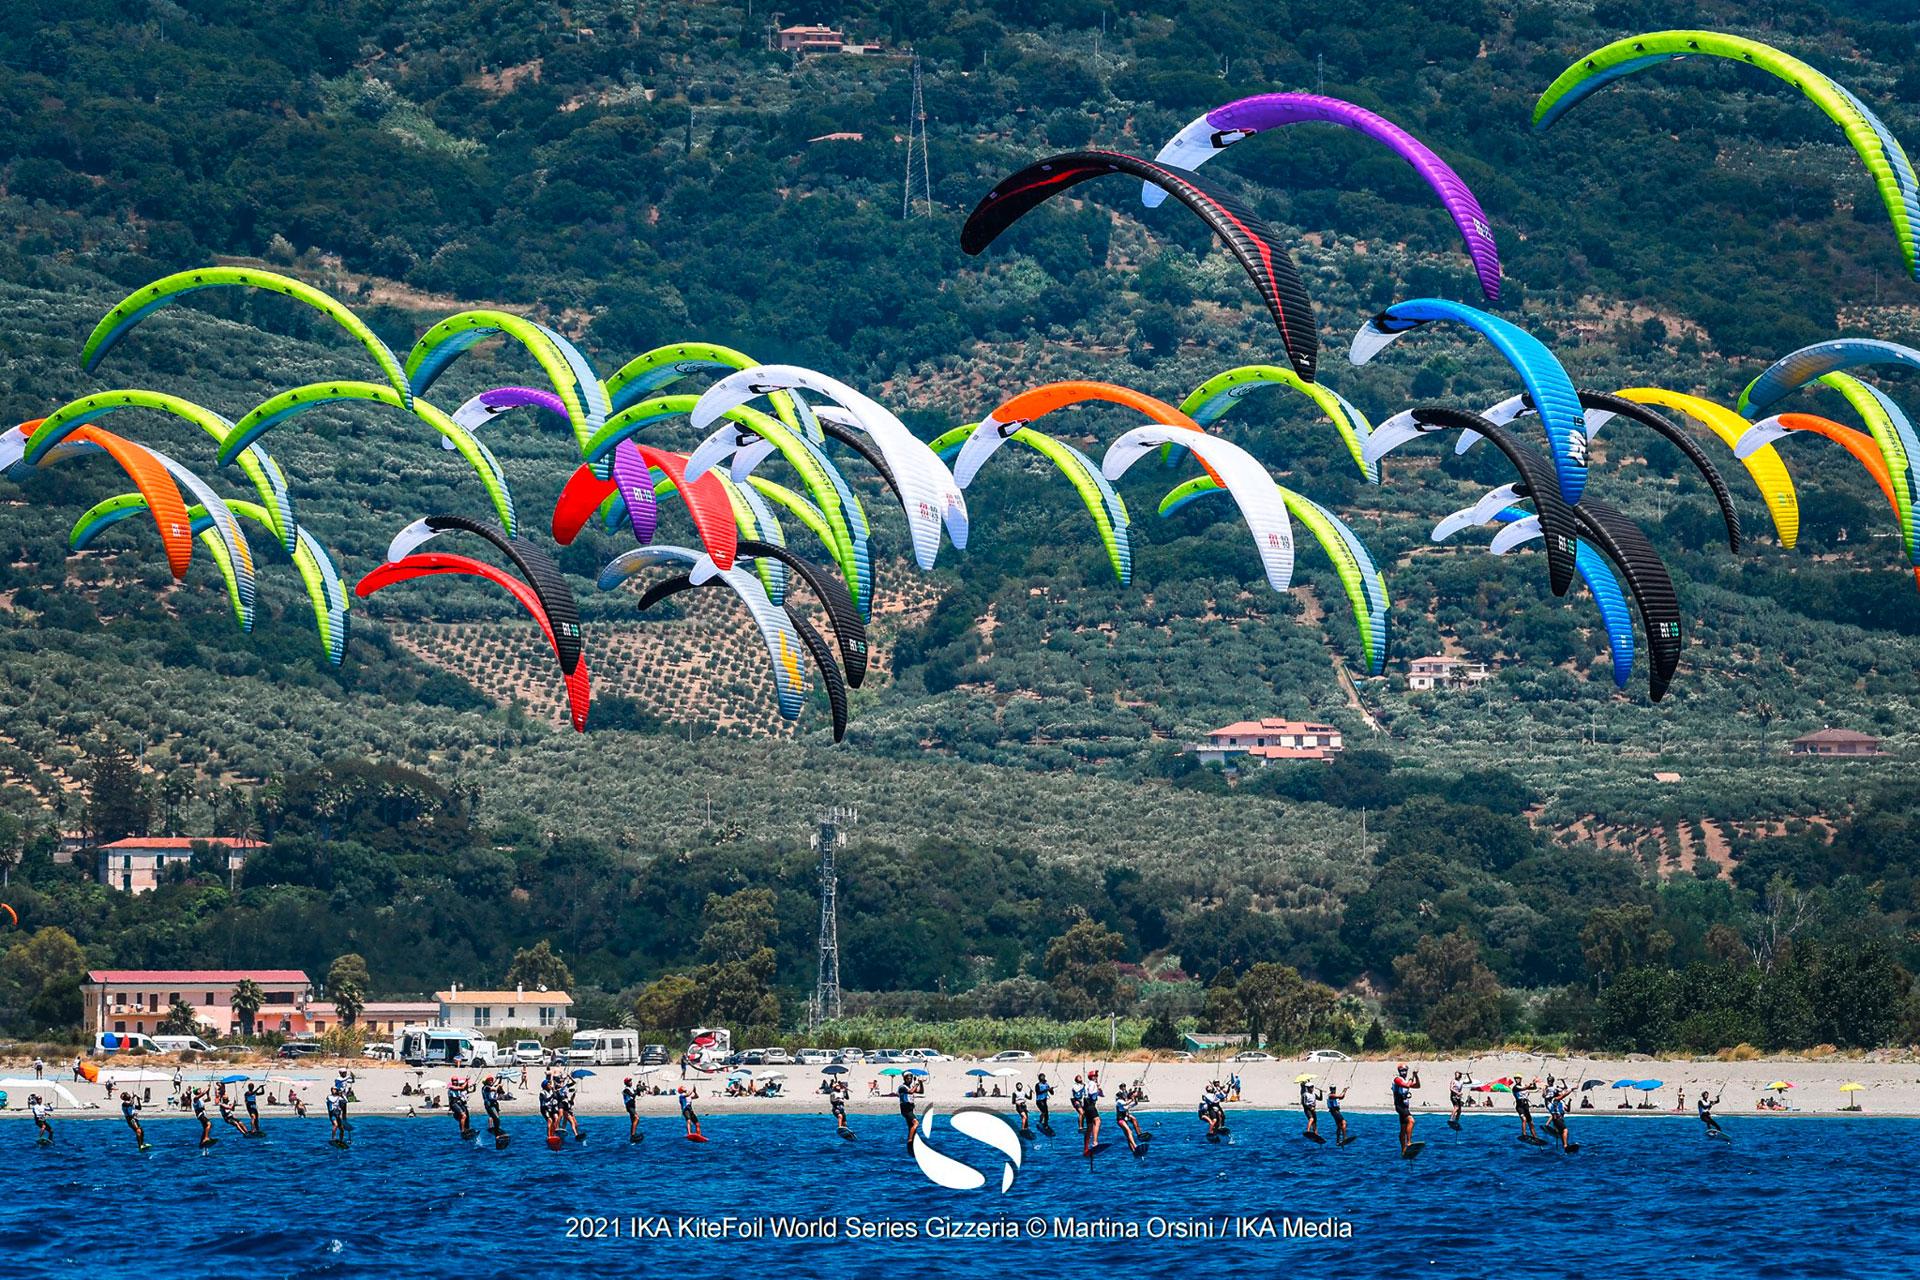 Kitefoil world series in Gizzeria